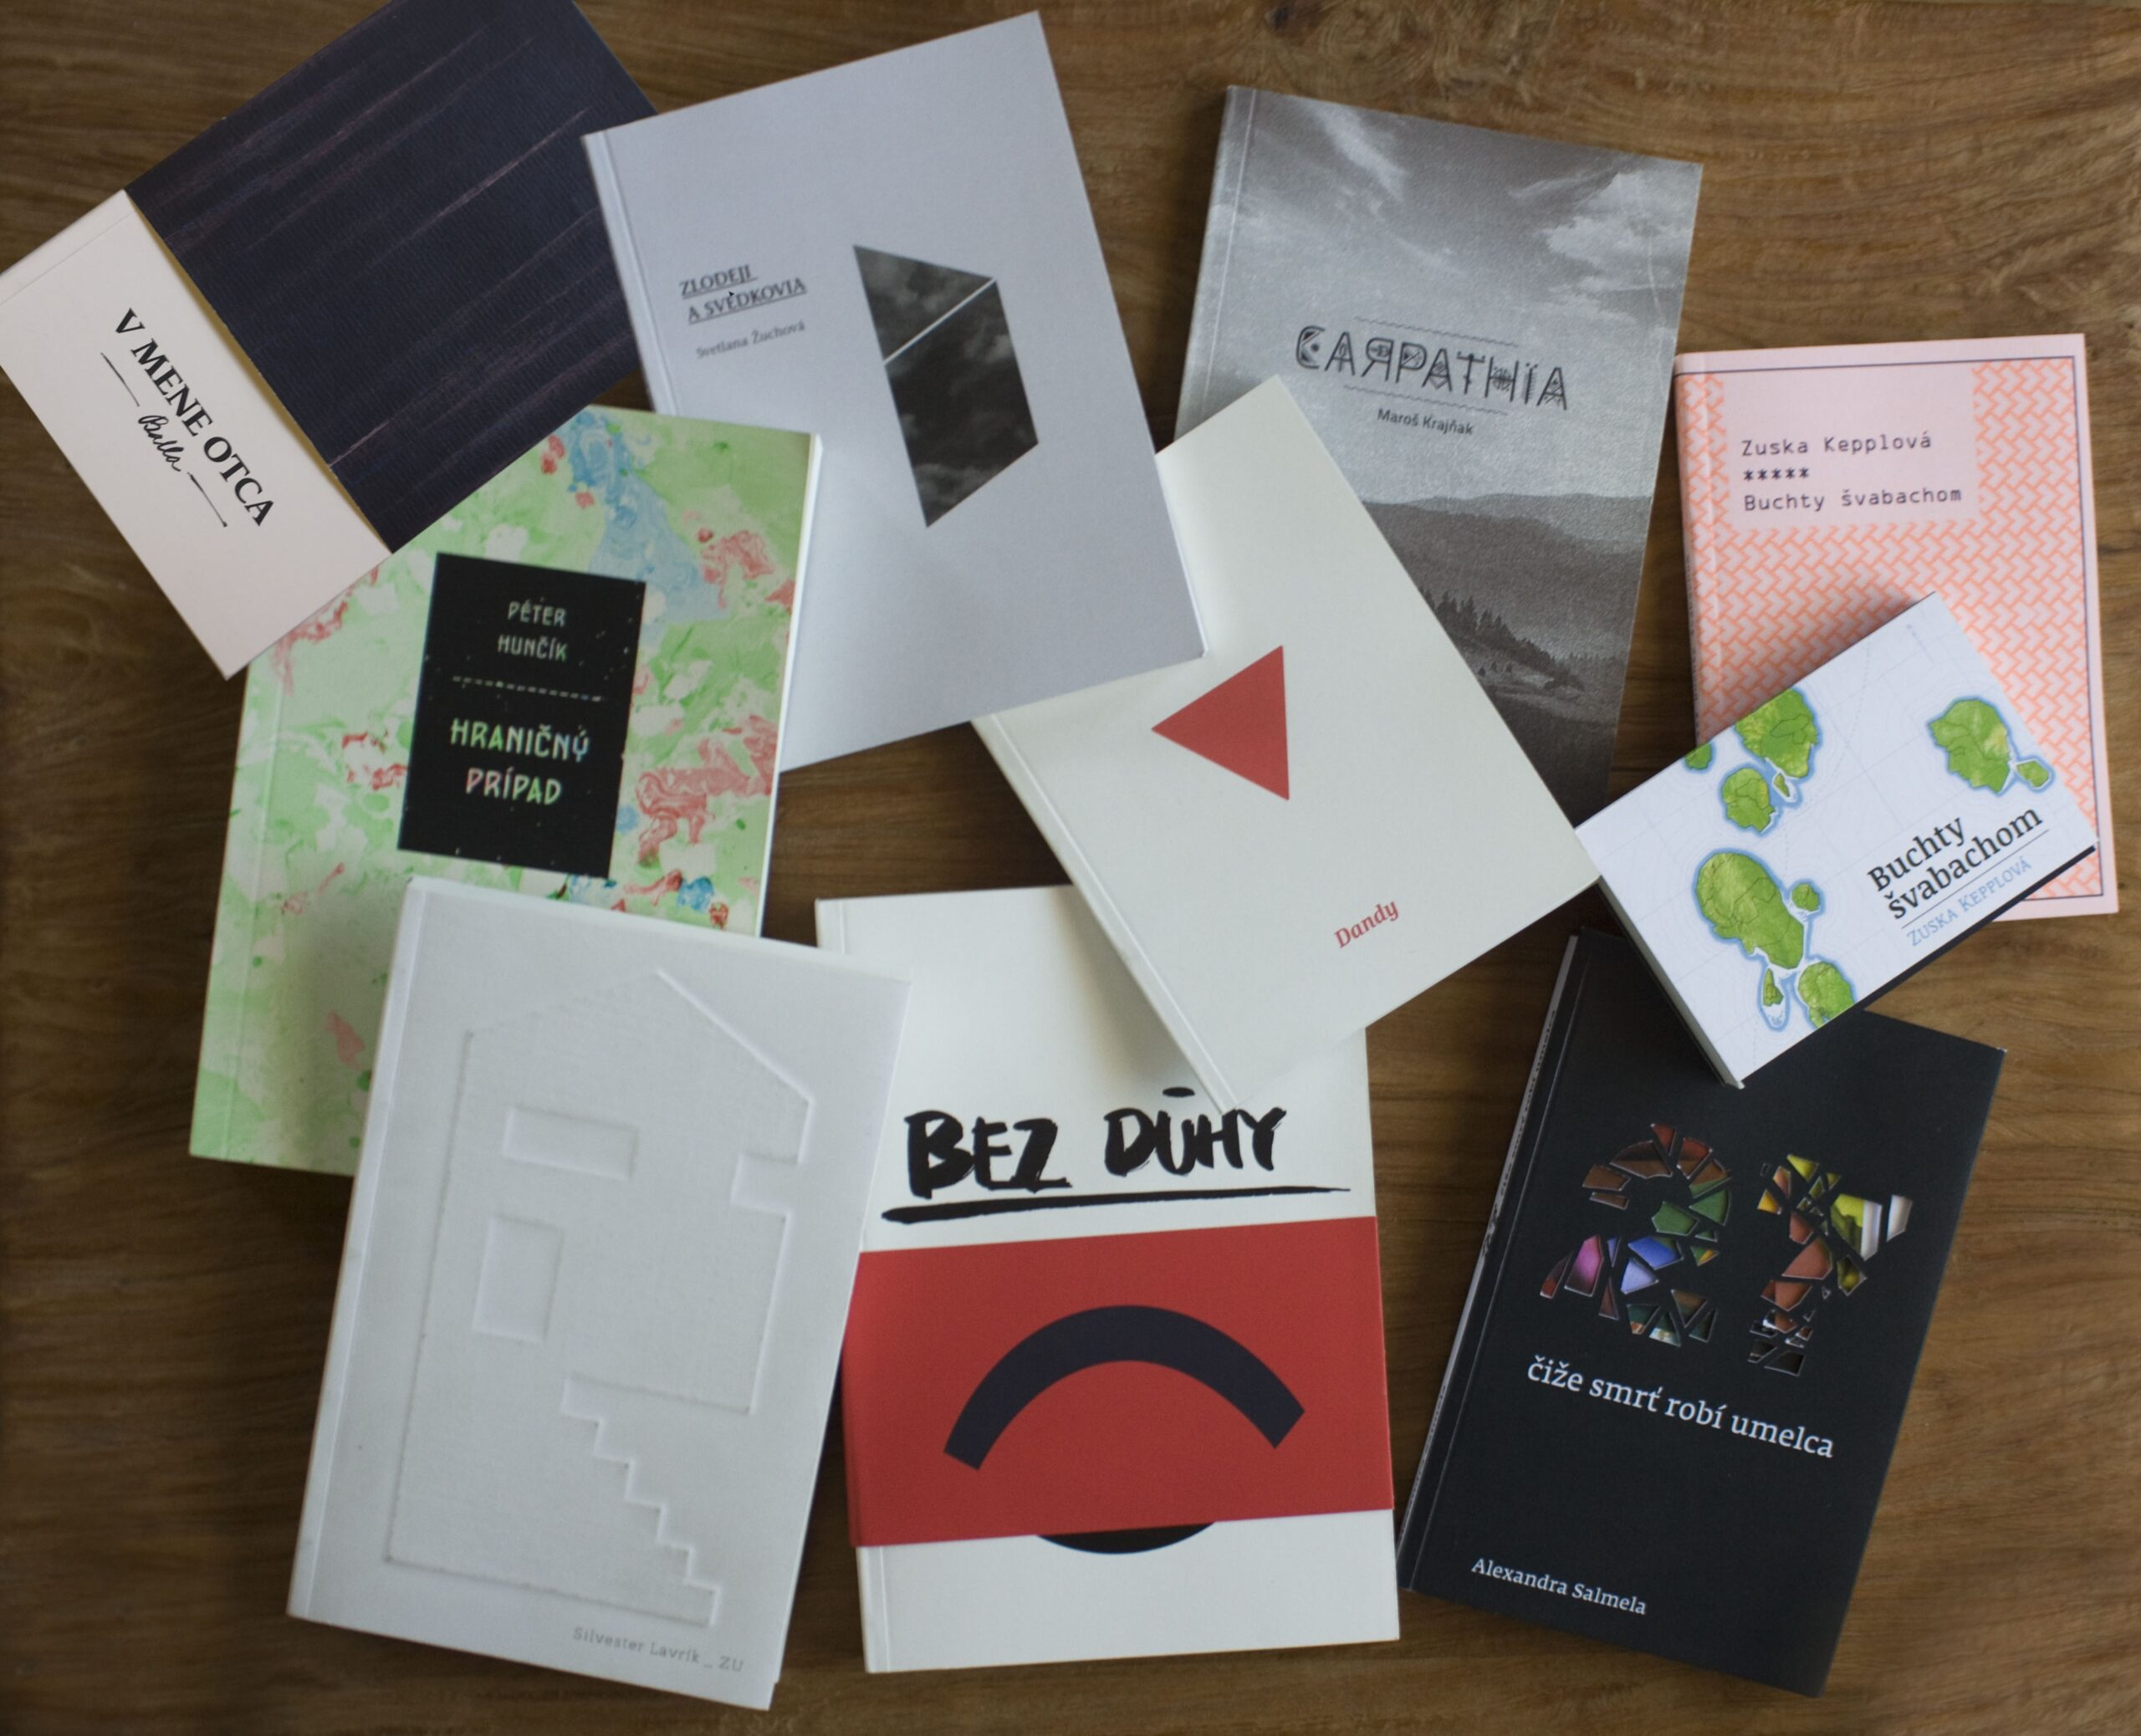 Redizajn kníh finalistov Anasoft litera 2012,